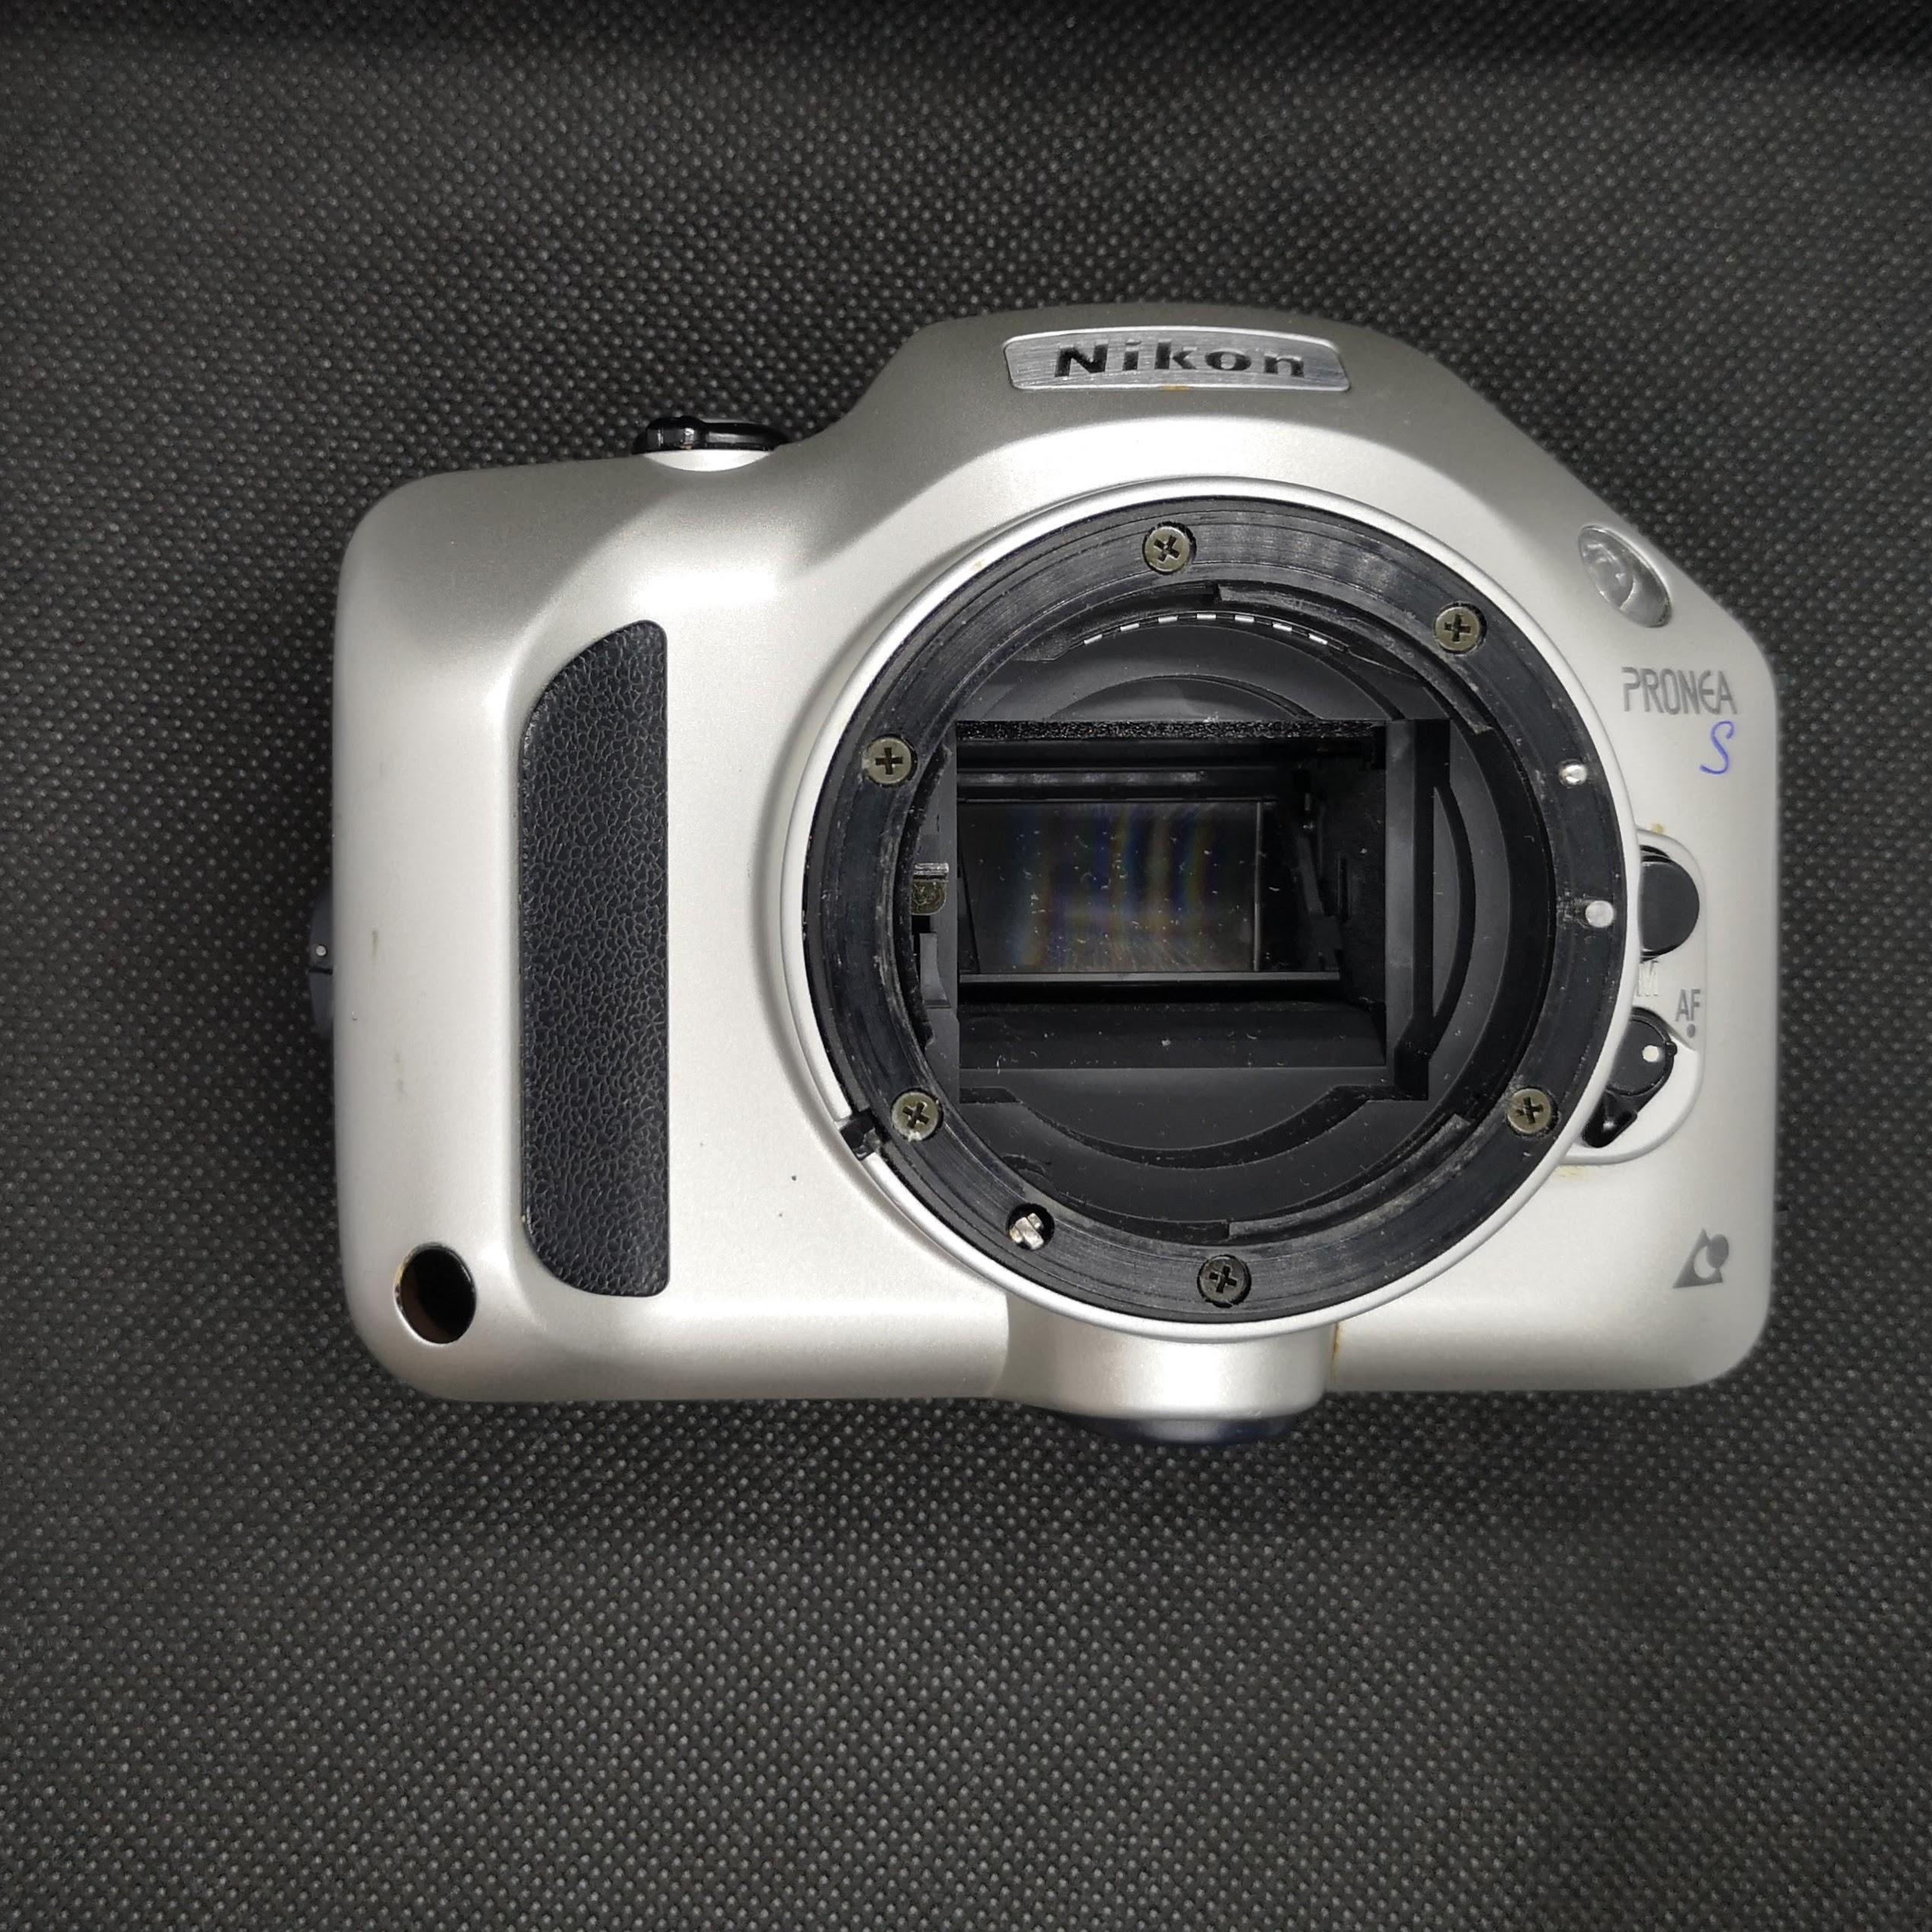 Nikon Pronea S without lens. Note plastic F mount